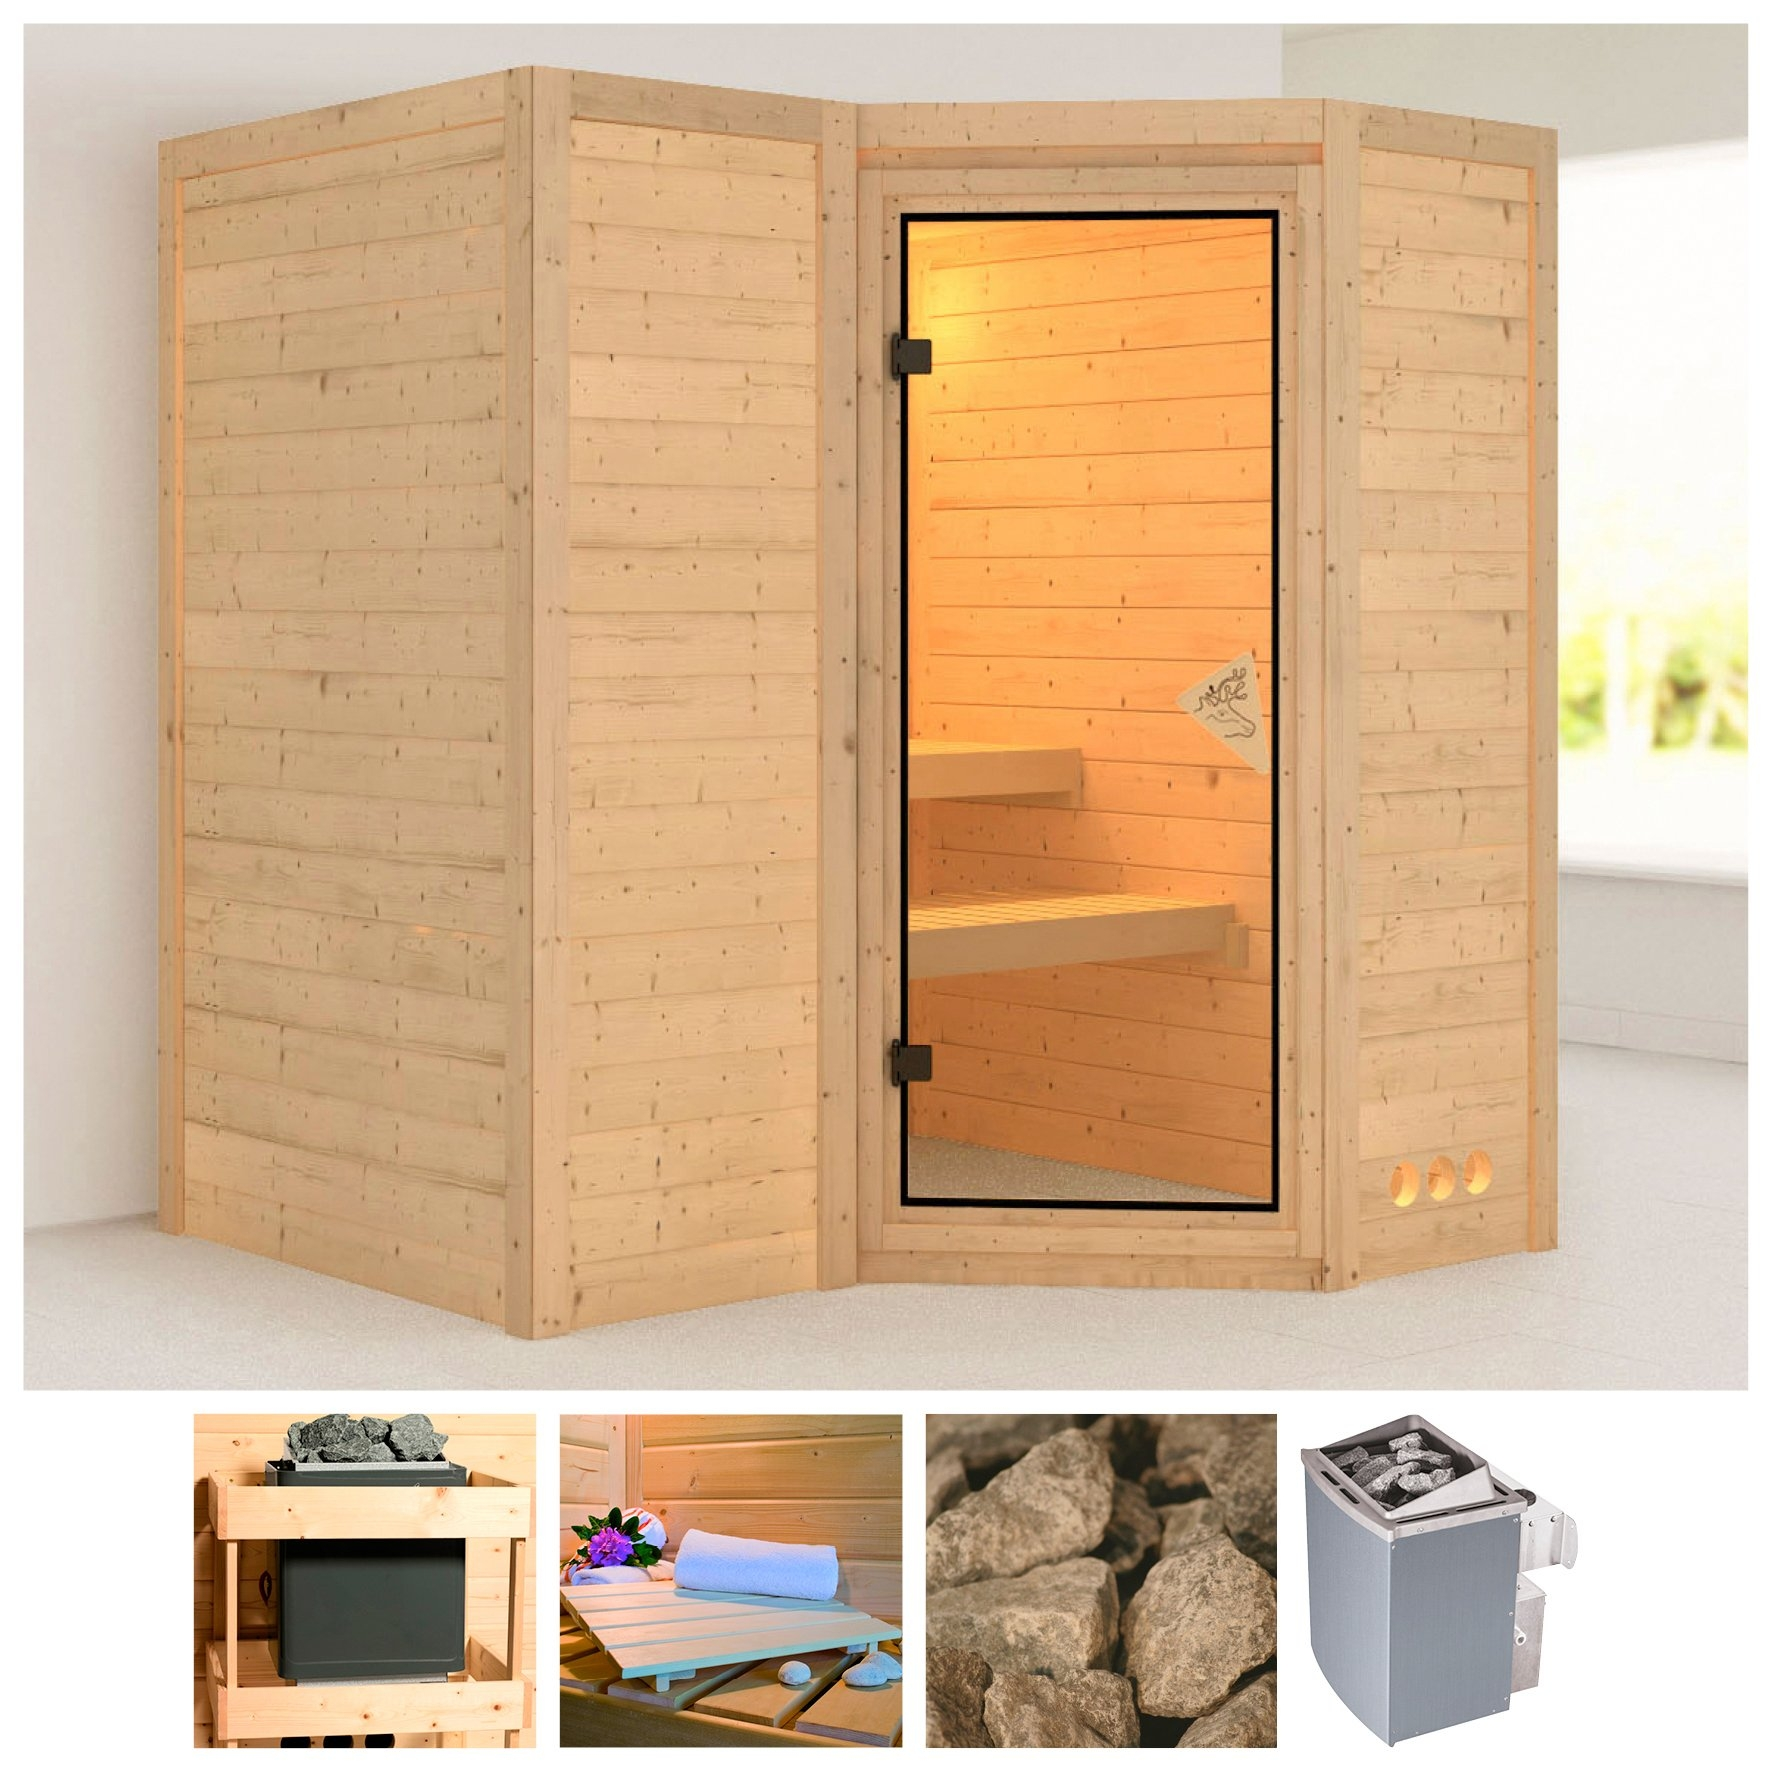 Karibu sauna »Sahib 1«, 193x184x208 cm, 9 kW Ofen mit int. Steuerung bestellen: 30 dagen bedenktijd